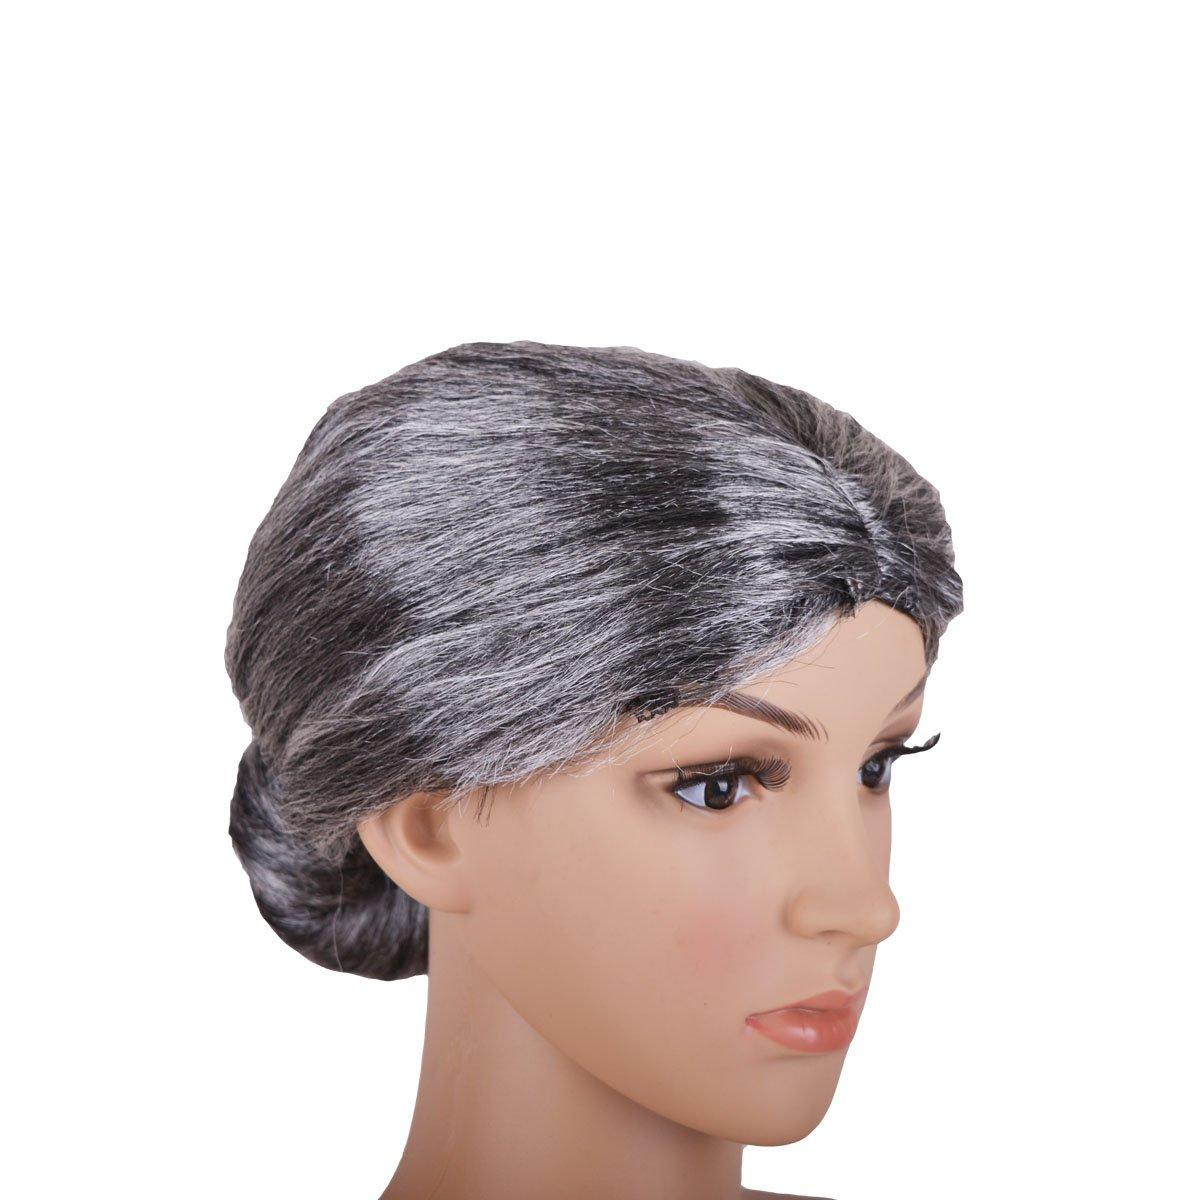 Baitaihem Grey Wig 2021 spring and summer new Granny Grandma Gray Lady Mother Old Grand El Paso Mall